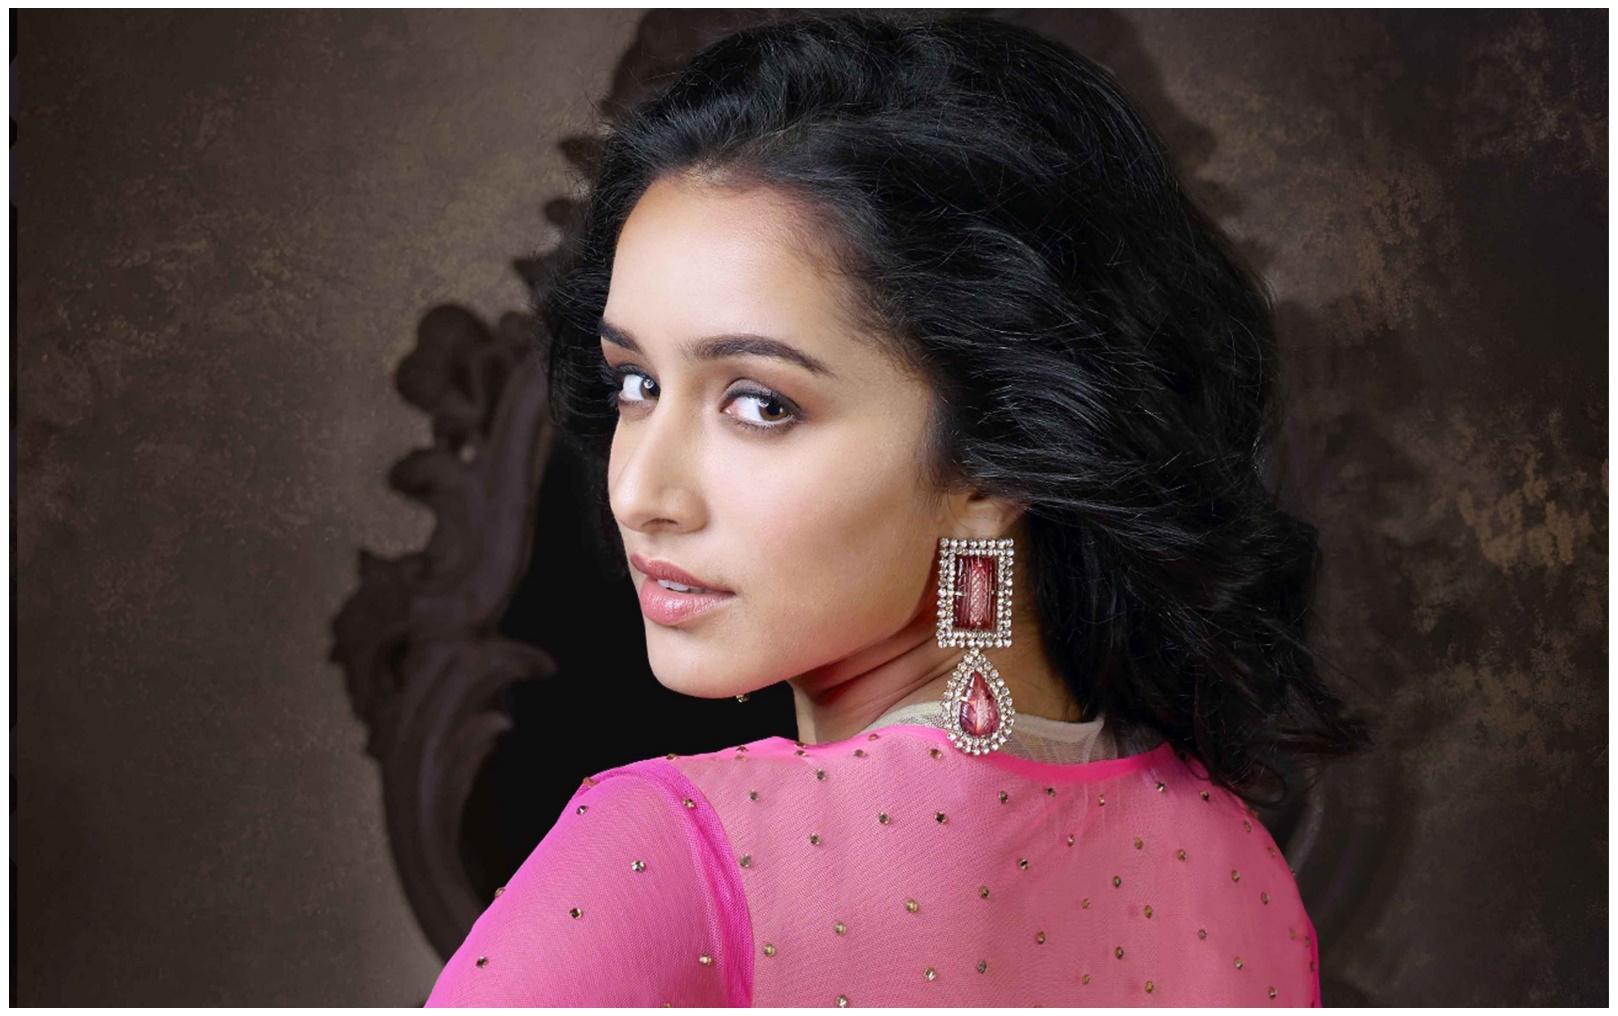 Parineeti Chopra Wallpaper 3d Bollywood Actress Shraddha Kapoor 2017 Hd Wallpapers Hd